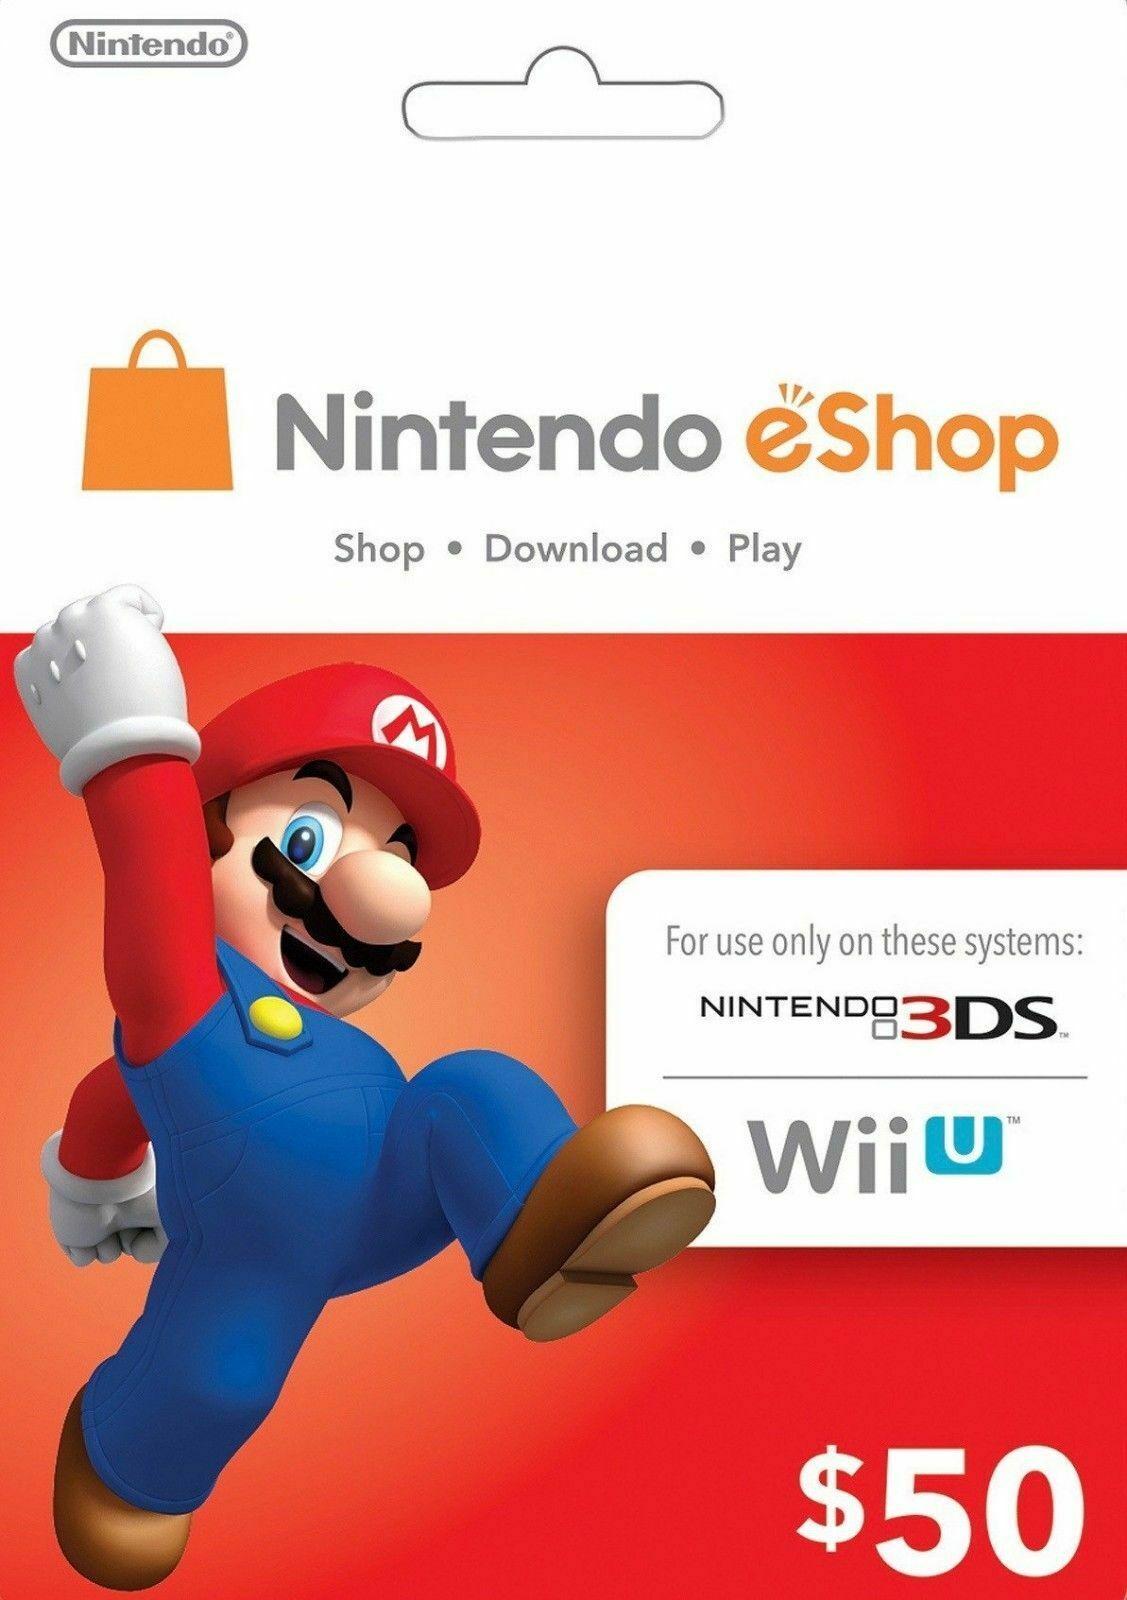 Nintendo Gift Cards gifts nintendo Nintendo